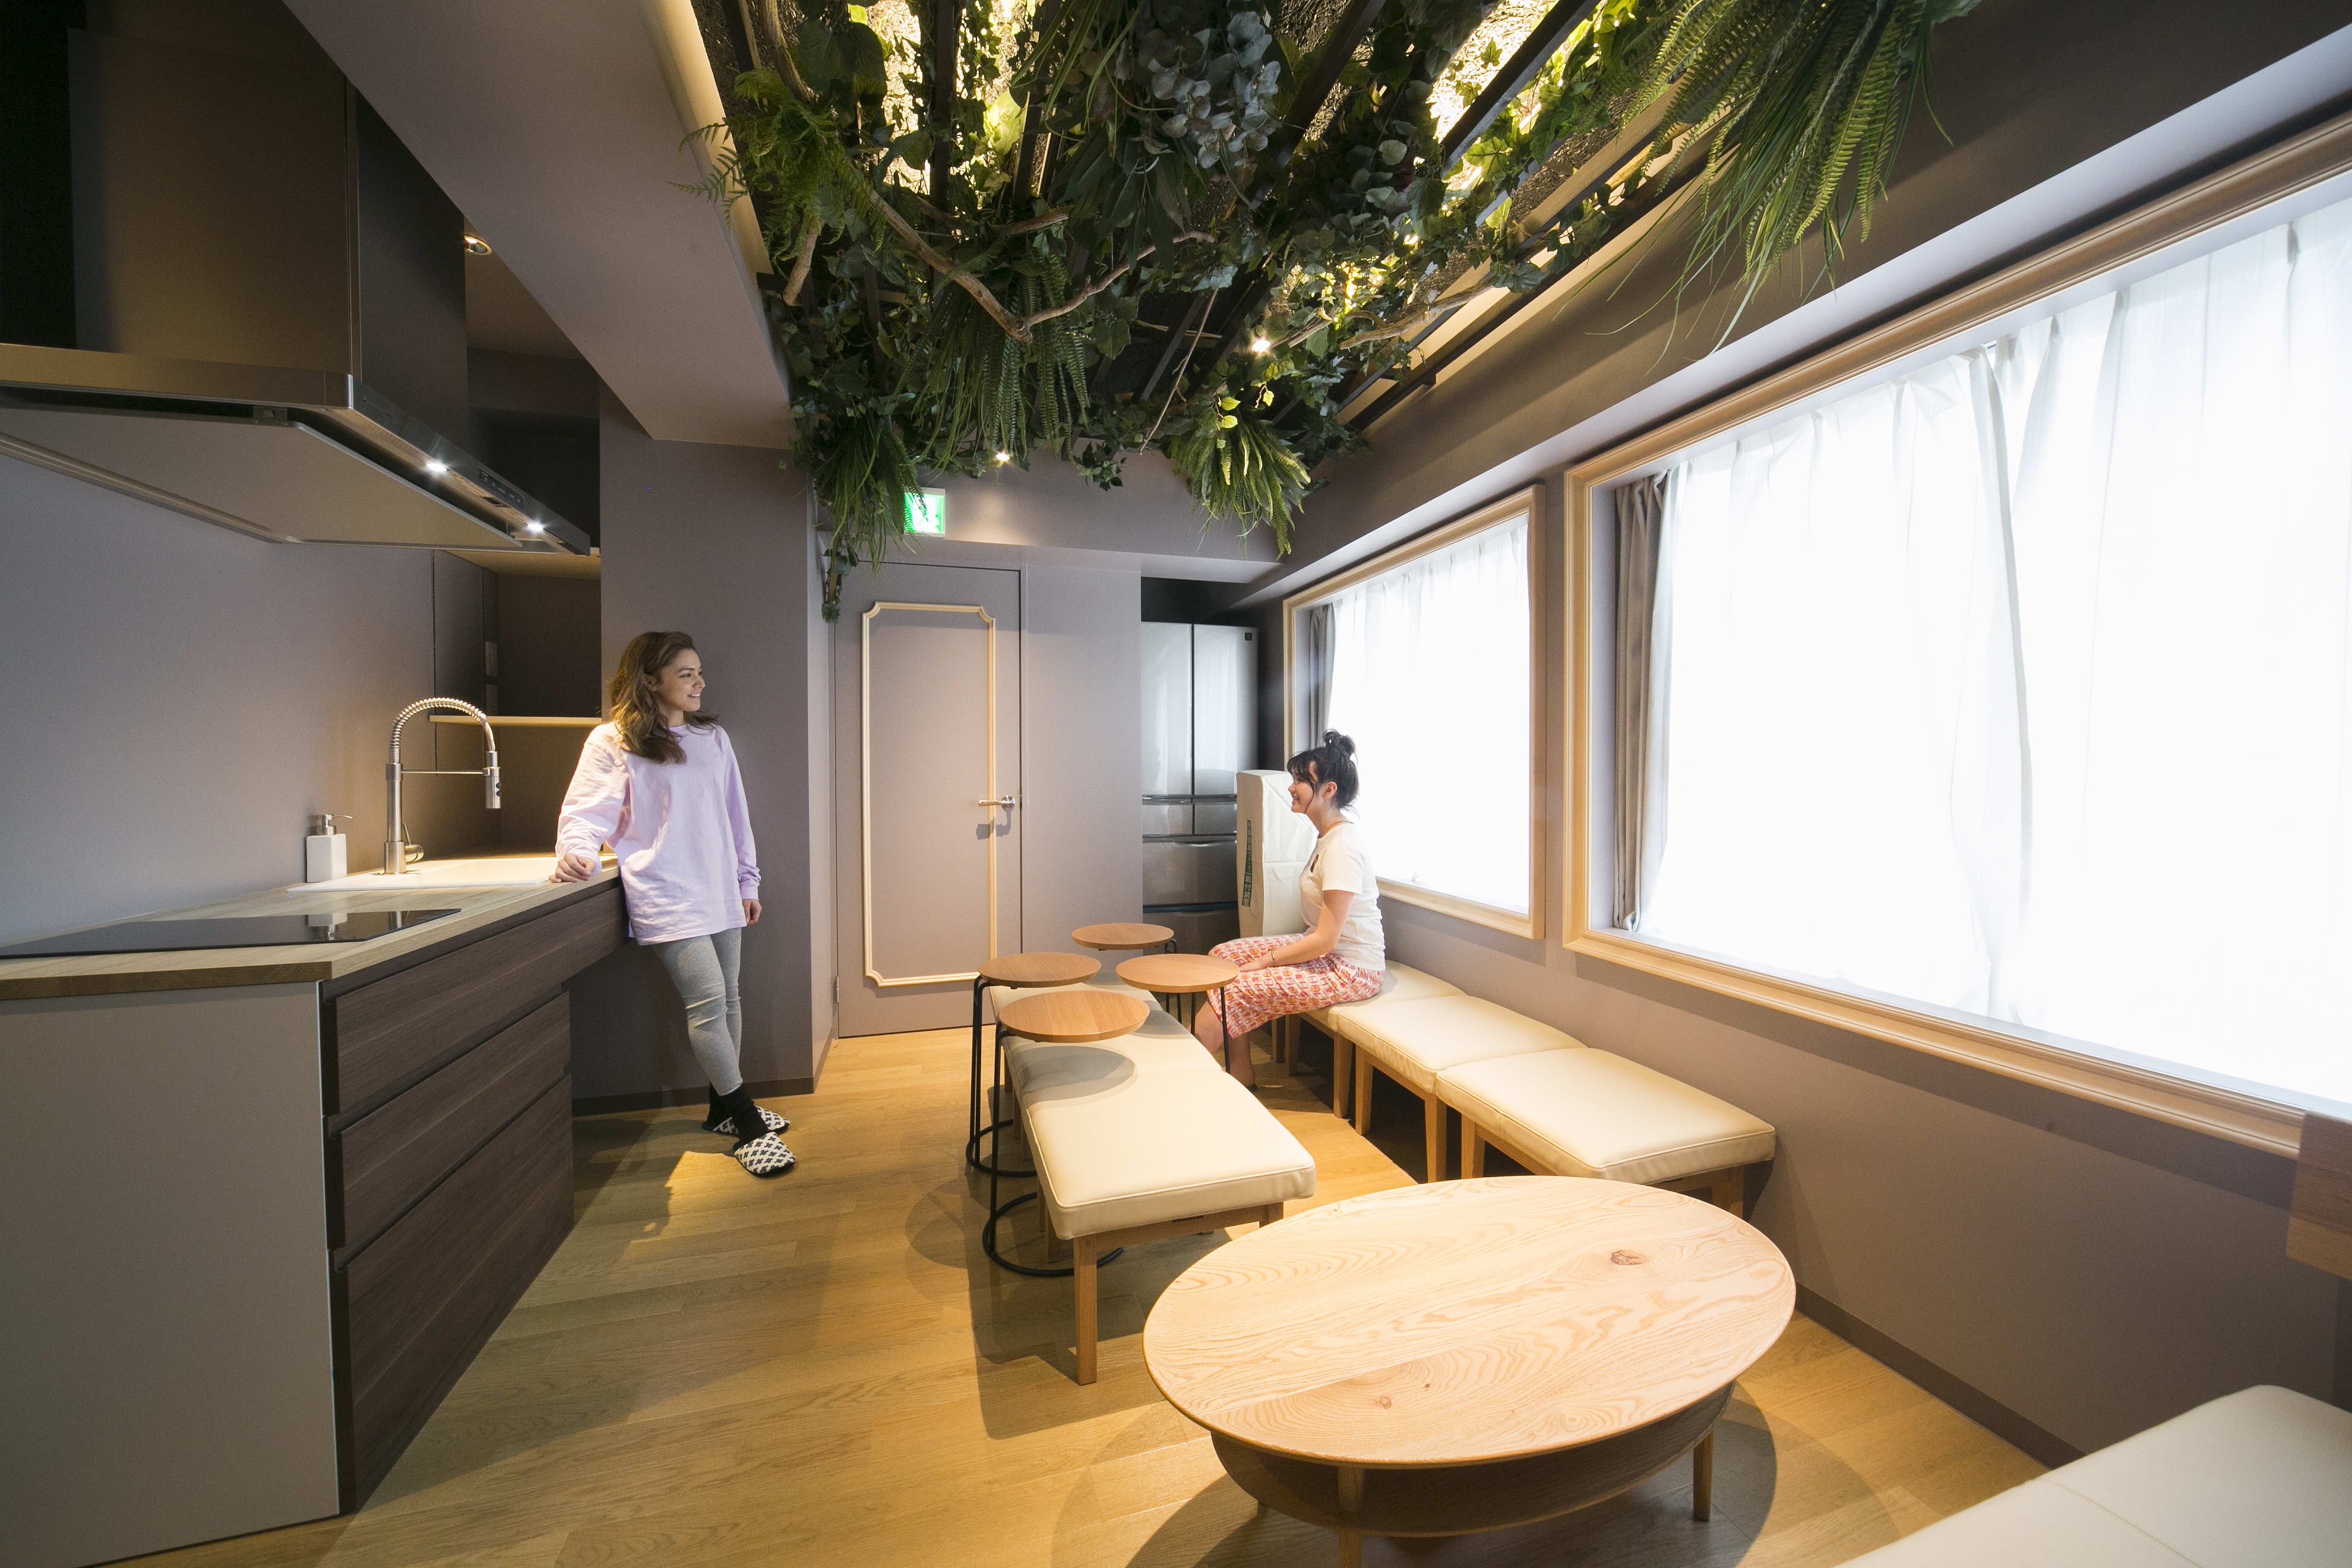 HOSTEL - The Wardrobe Hostel Forest Shimokitazawa